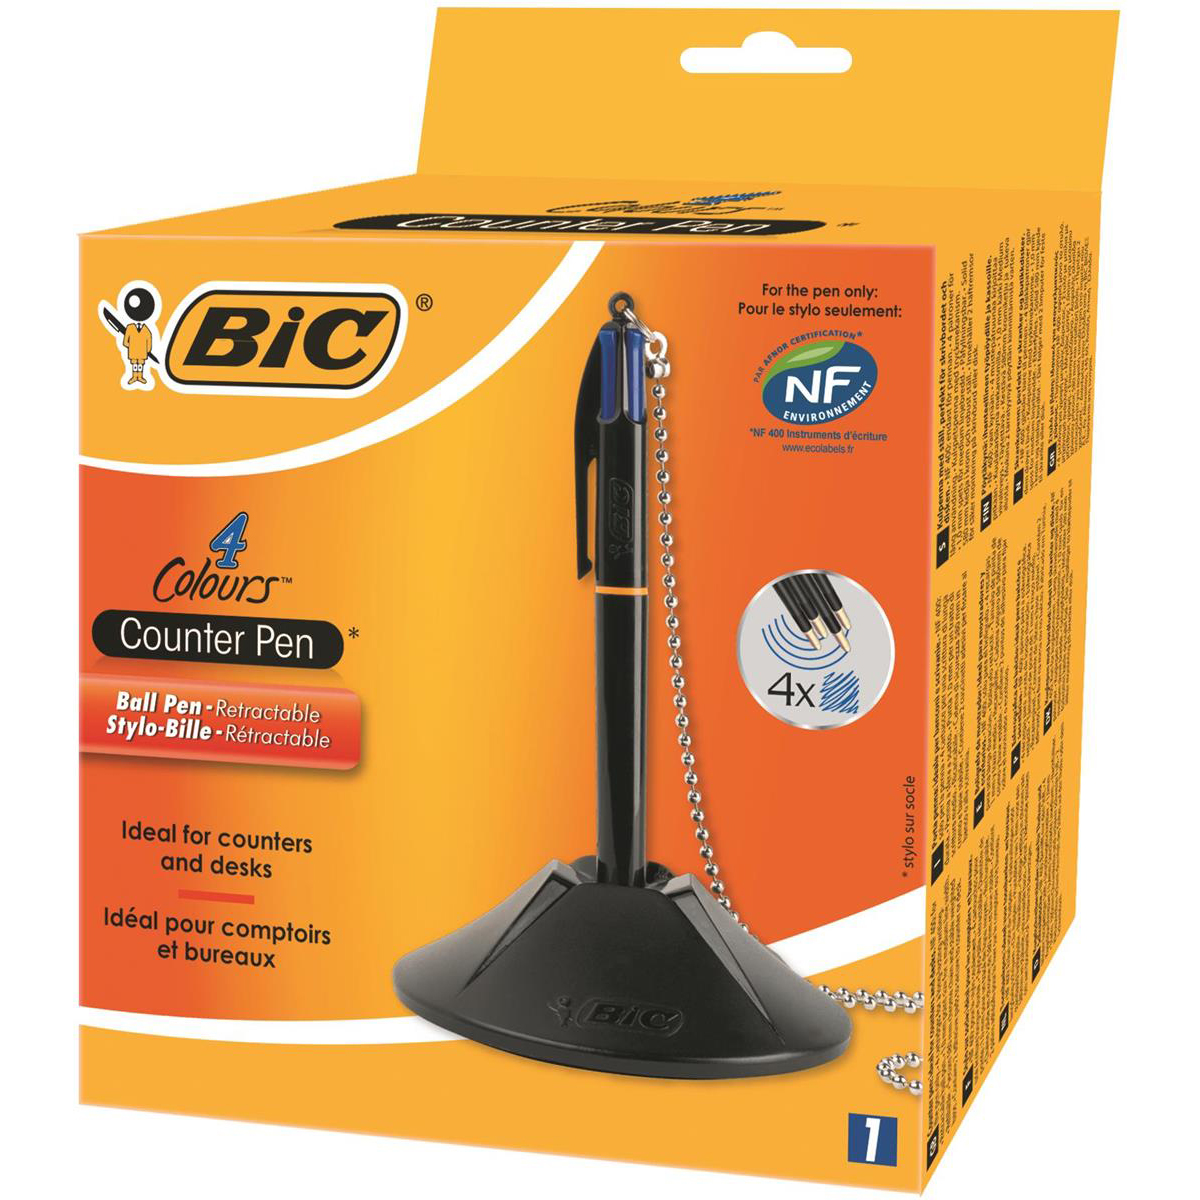 Bic 4 Colour Way Counter Pen Refillable Retractable Medium 1.0mm Tip 0.32mm Line Blue Ref 918515